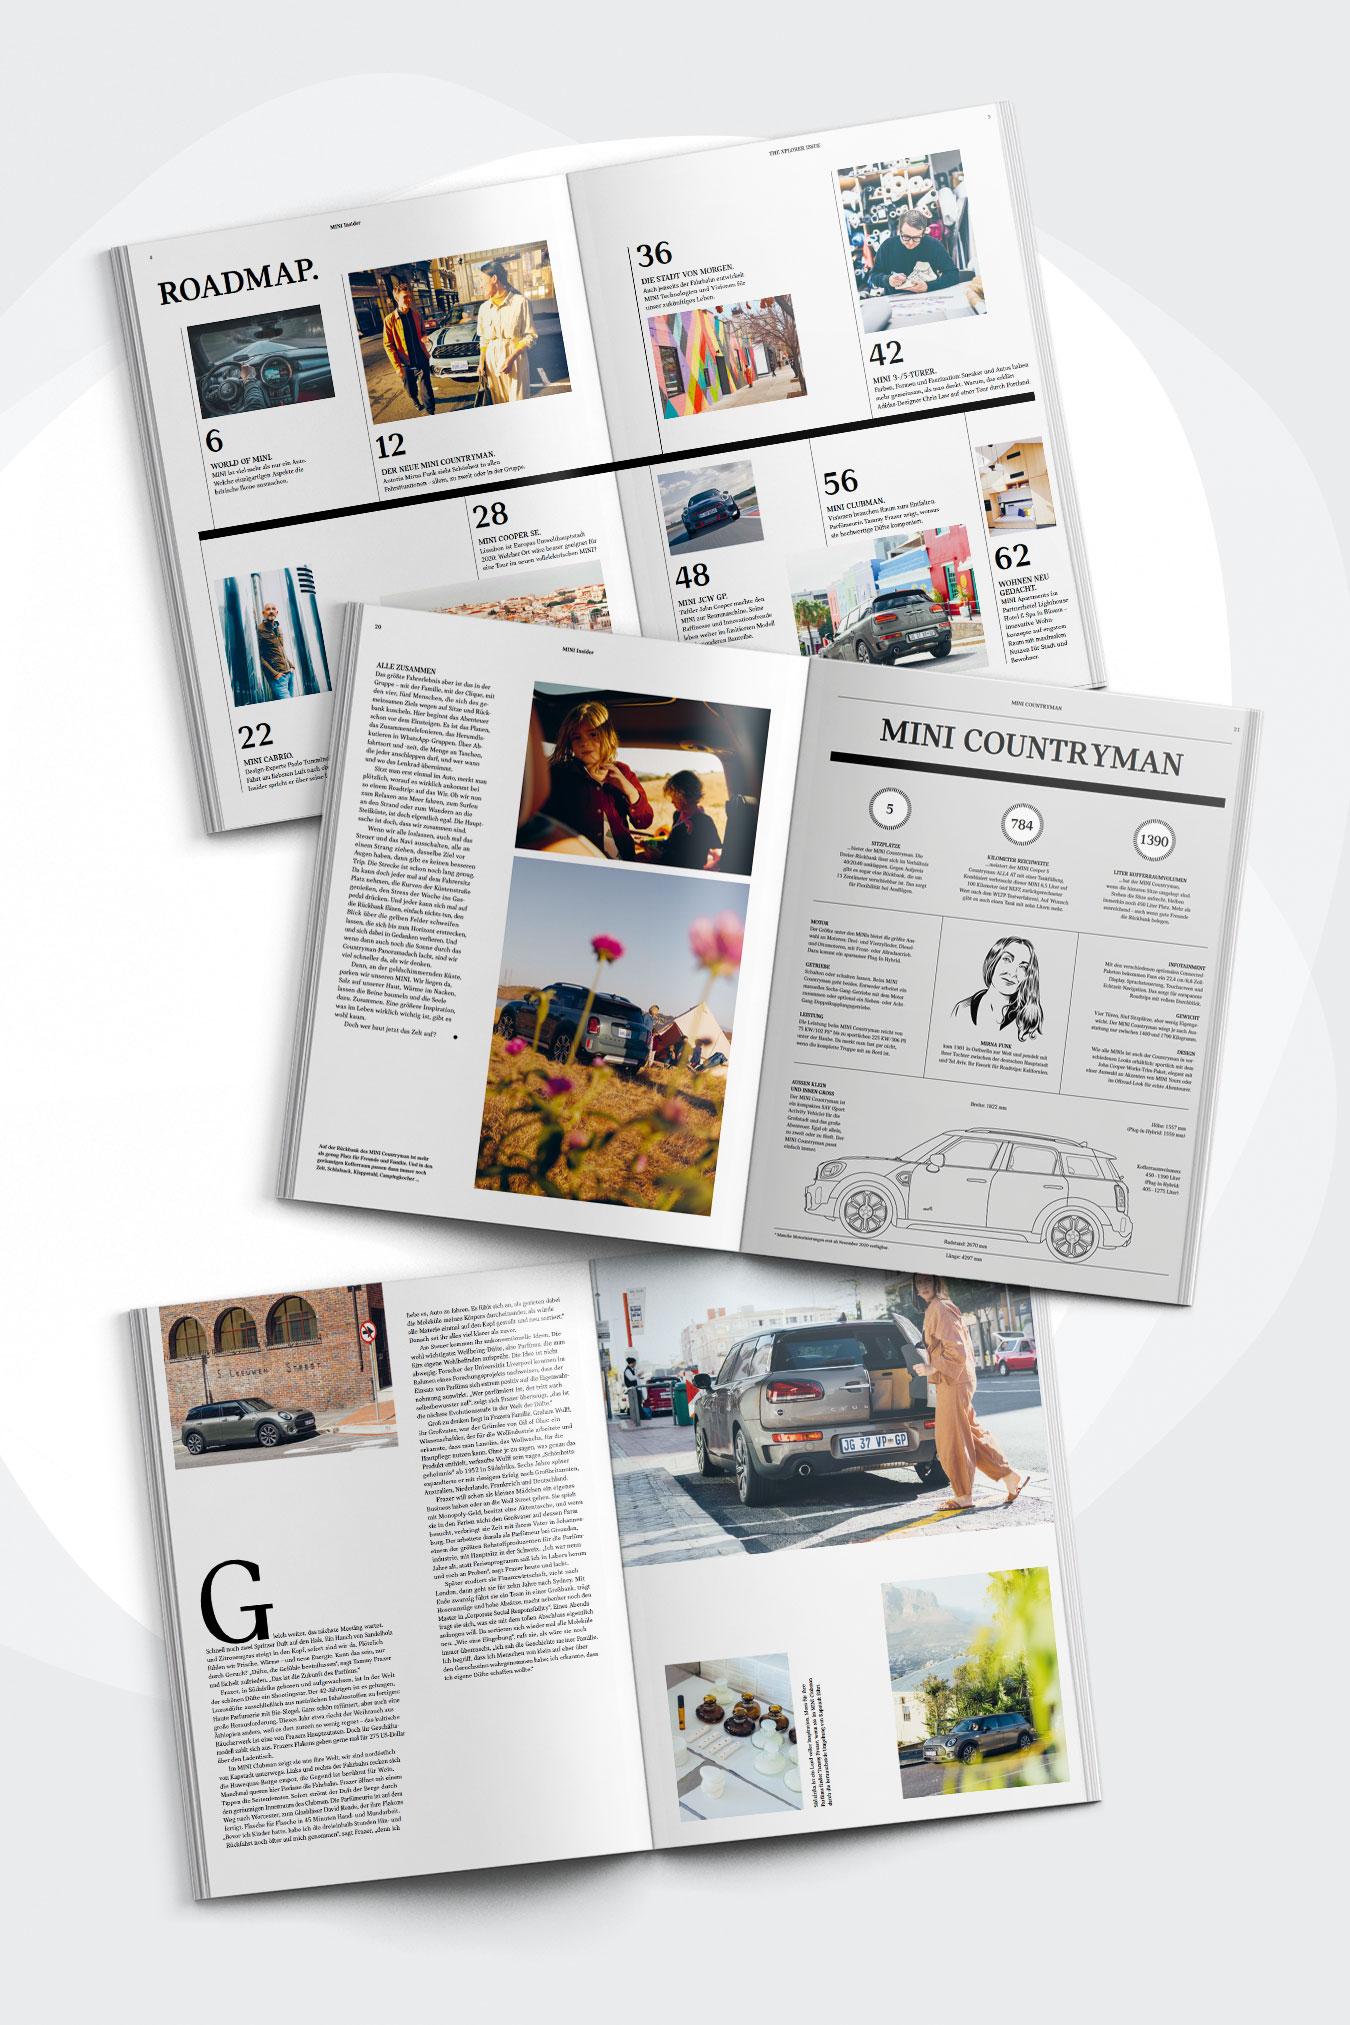 TERRITORY launcht neues Printmagazin für MINI